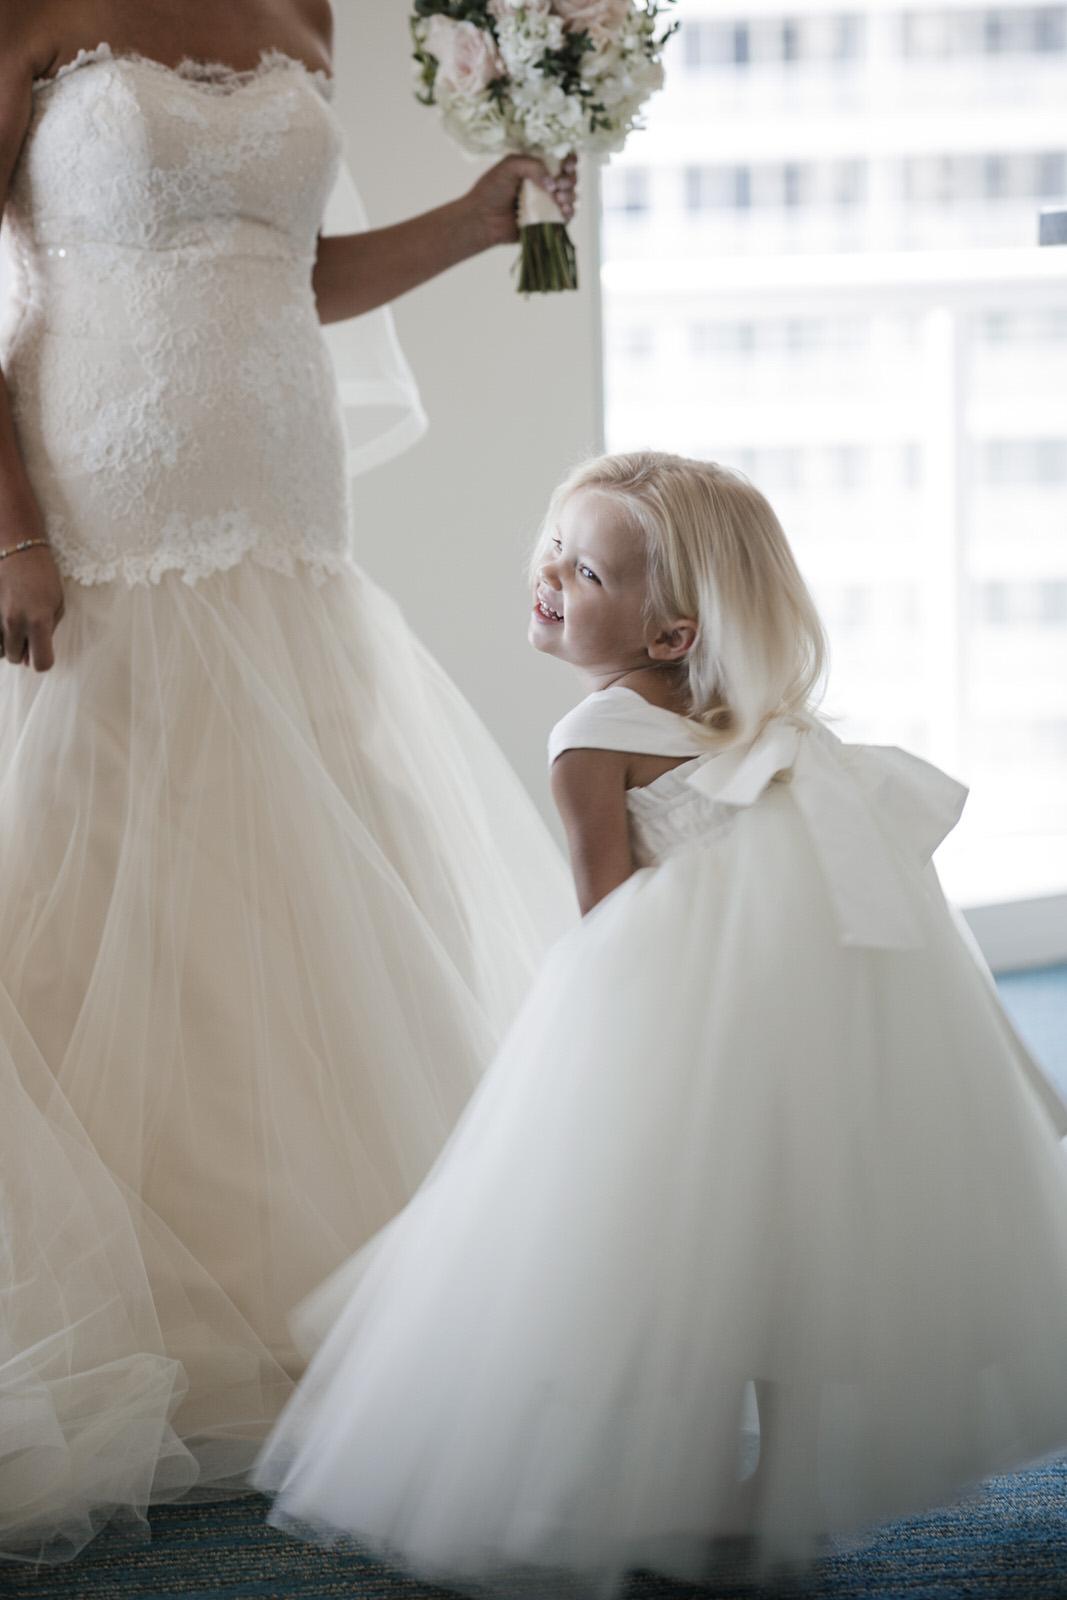 Christie-Tom-Wedding-Sonju-Photography-2018-78.JPG